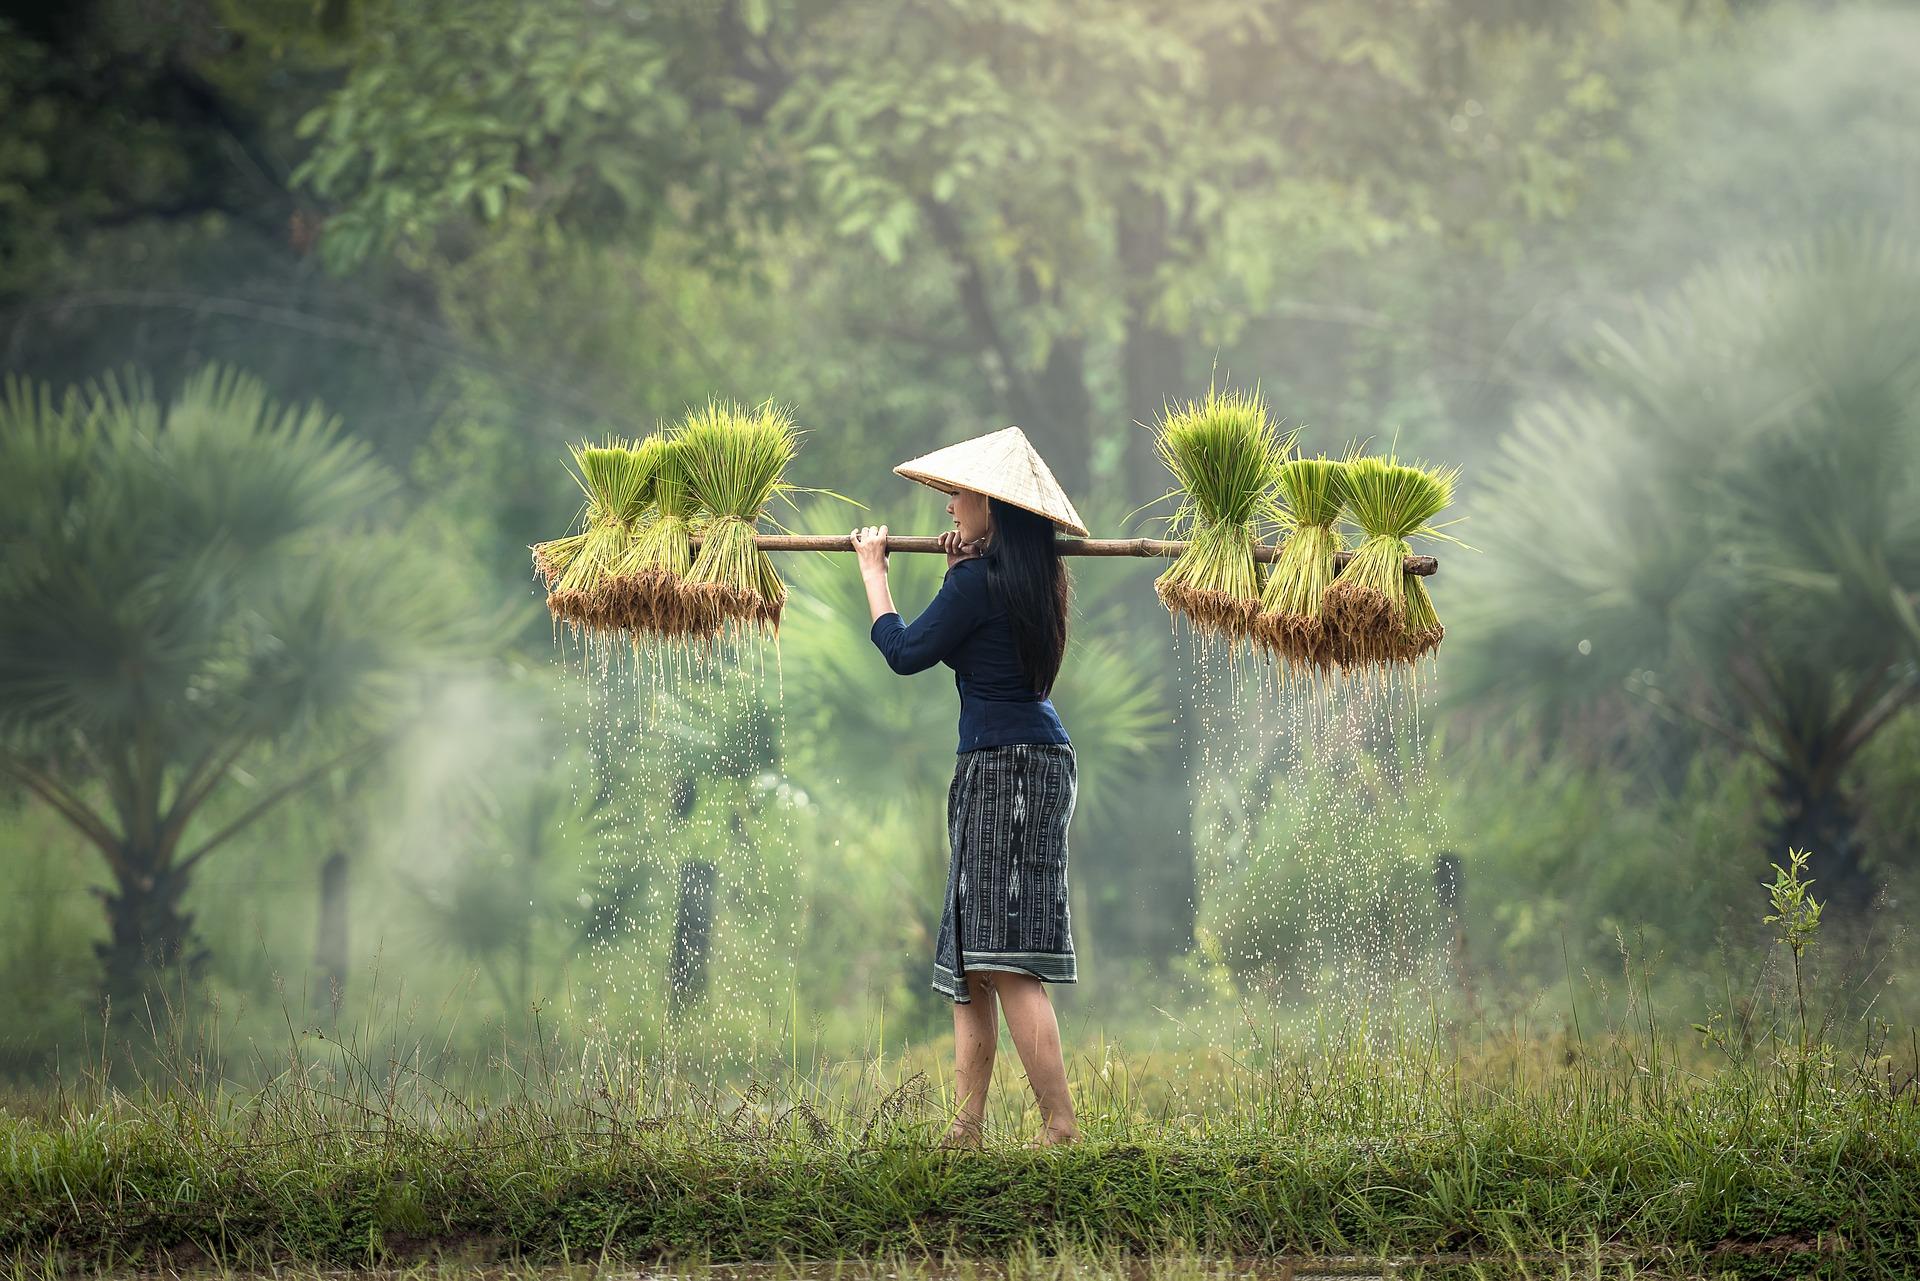 myanmar harvesting-1822578_1920